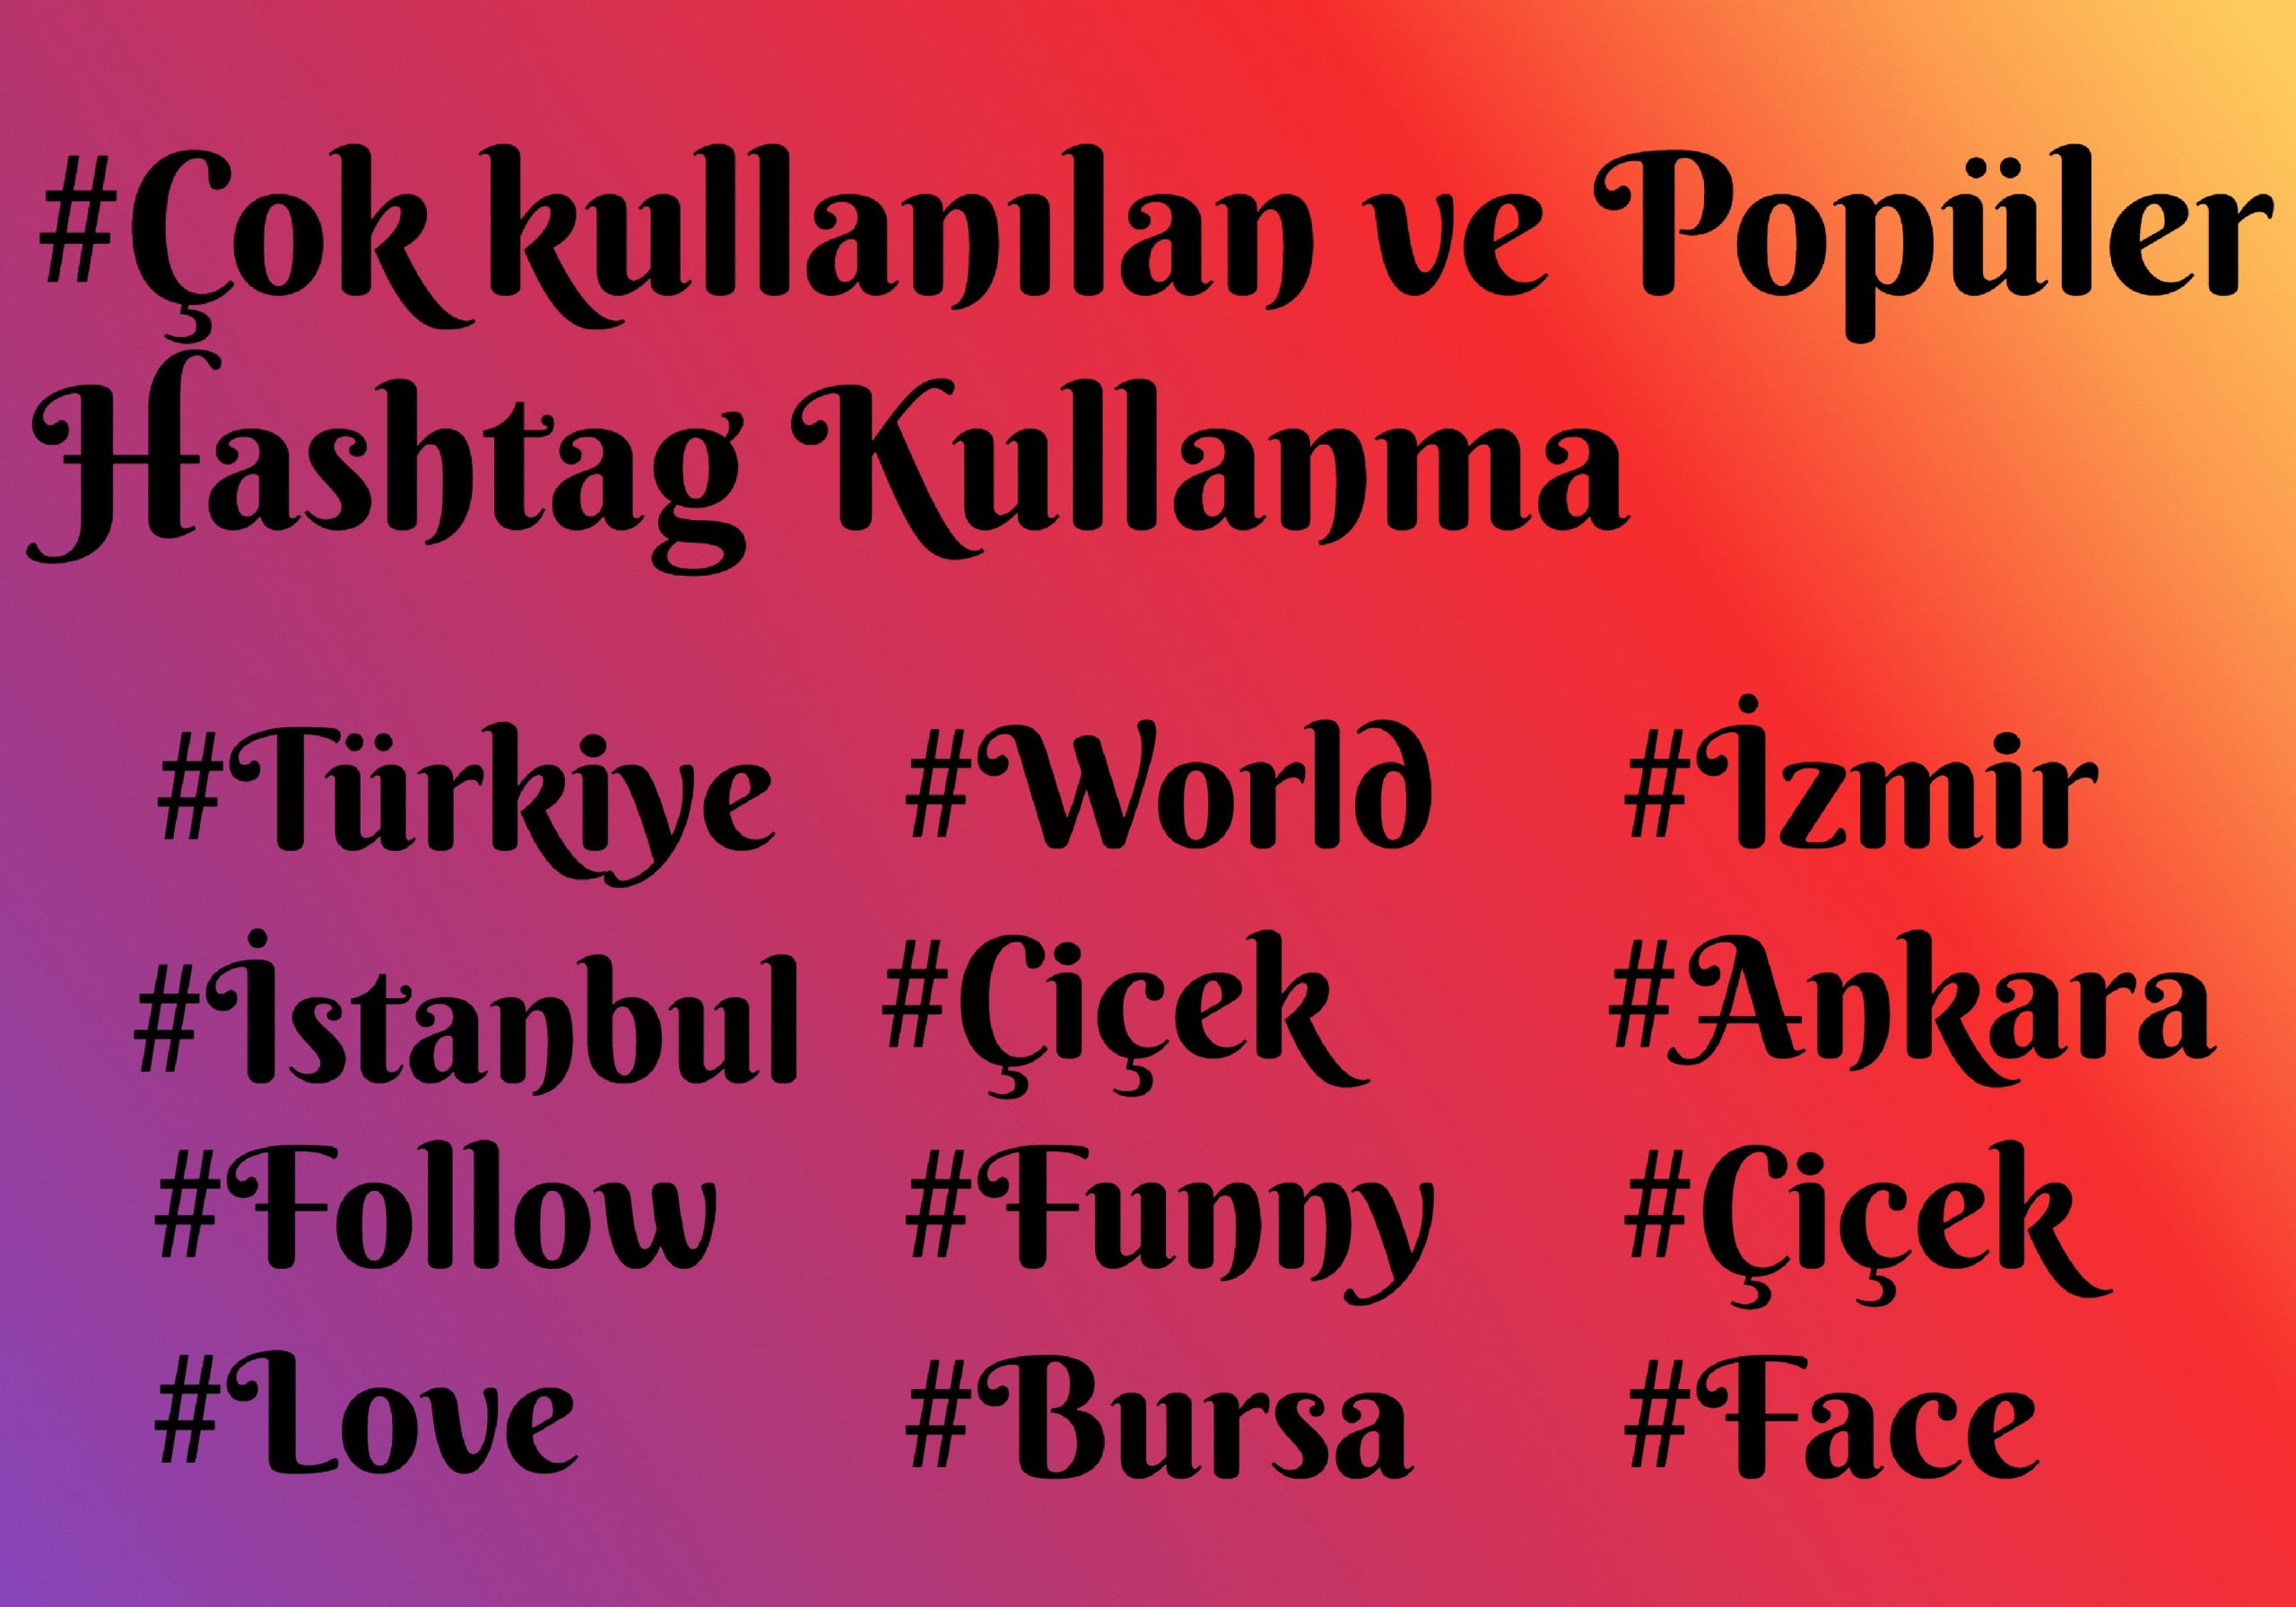 instagram populer hashtag webhakim